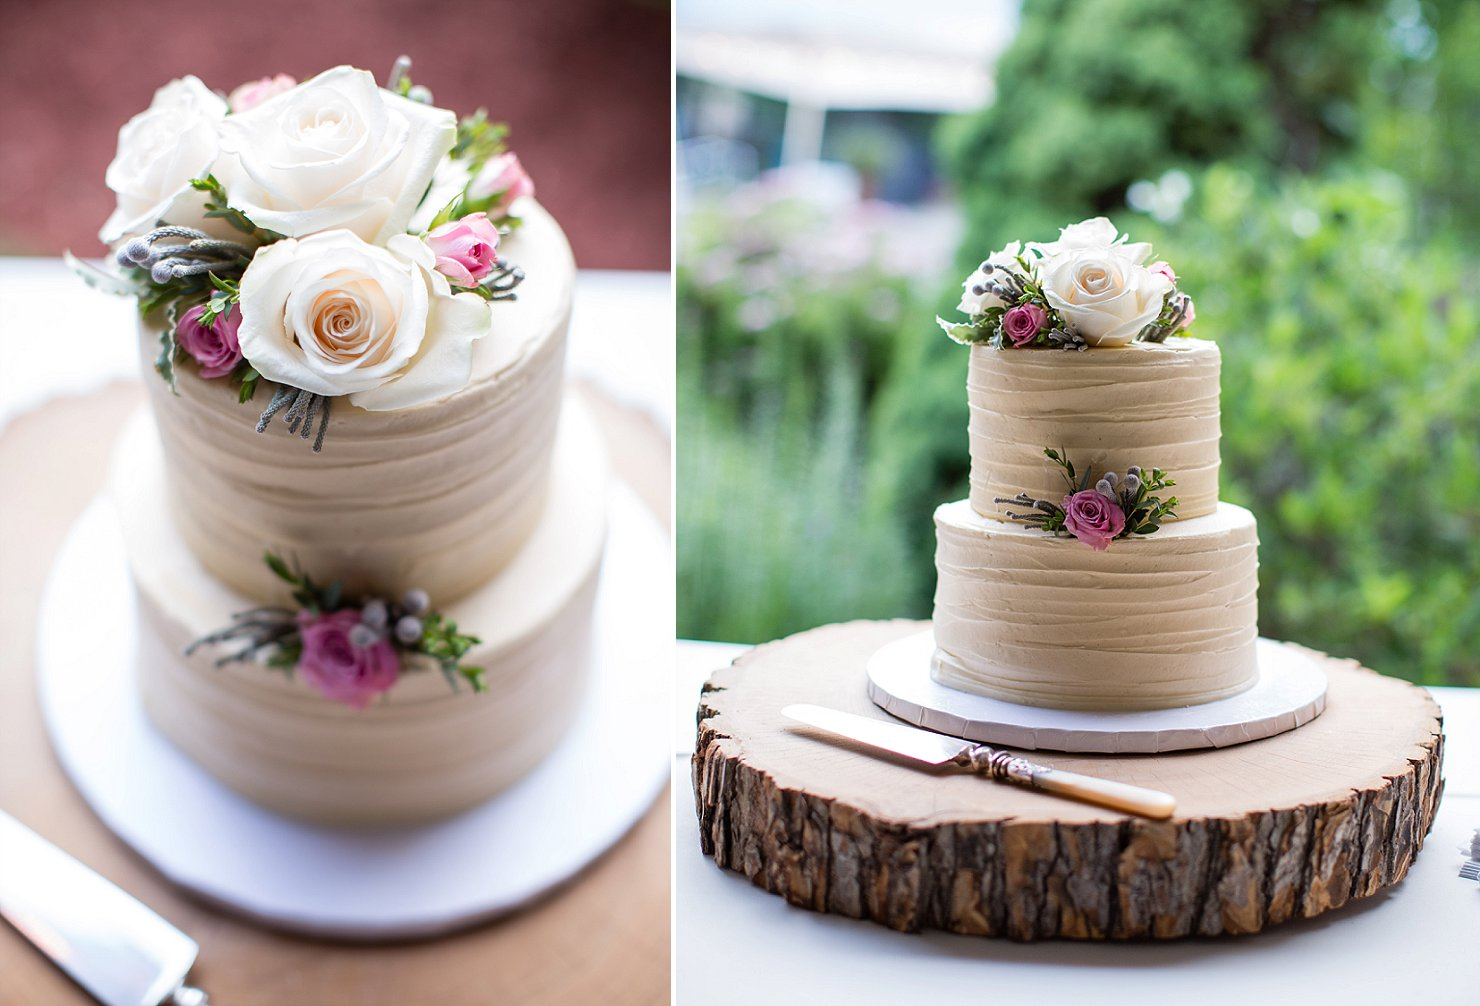 Backyard Wedding Cake Ideas modern rustic backyard nh wedding   erika follansbee   nh wedding